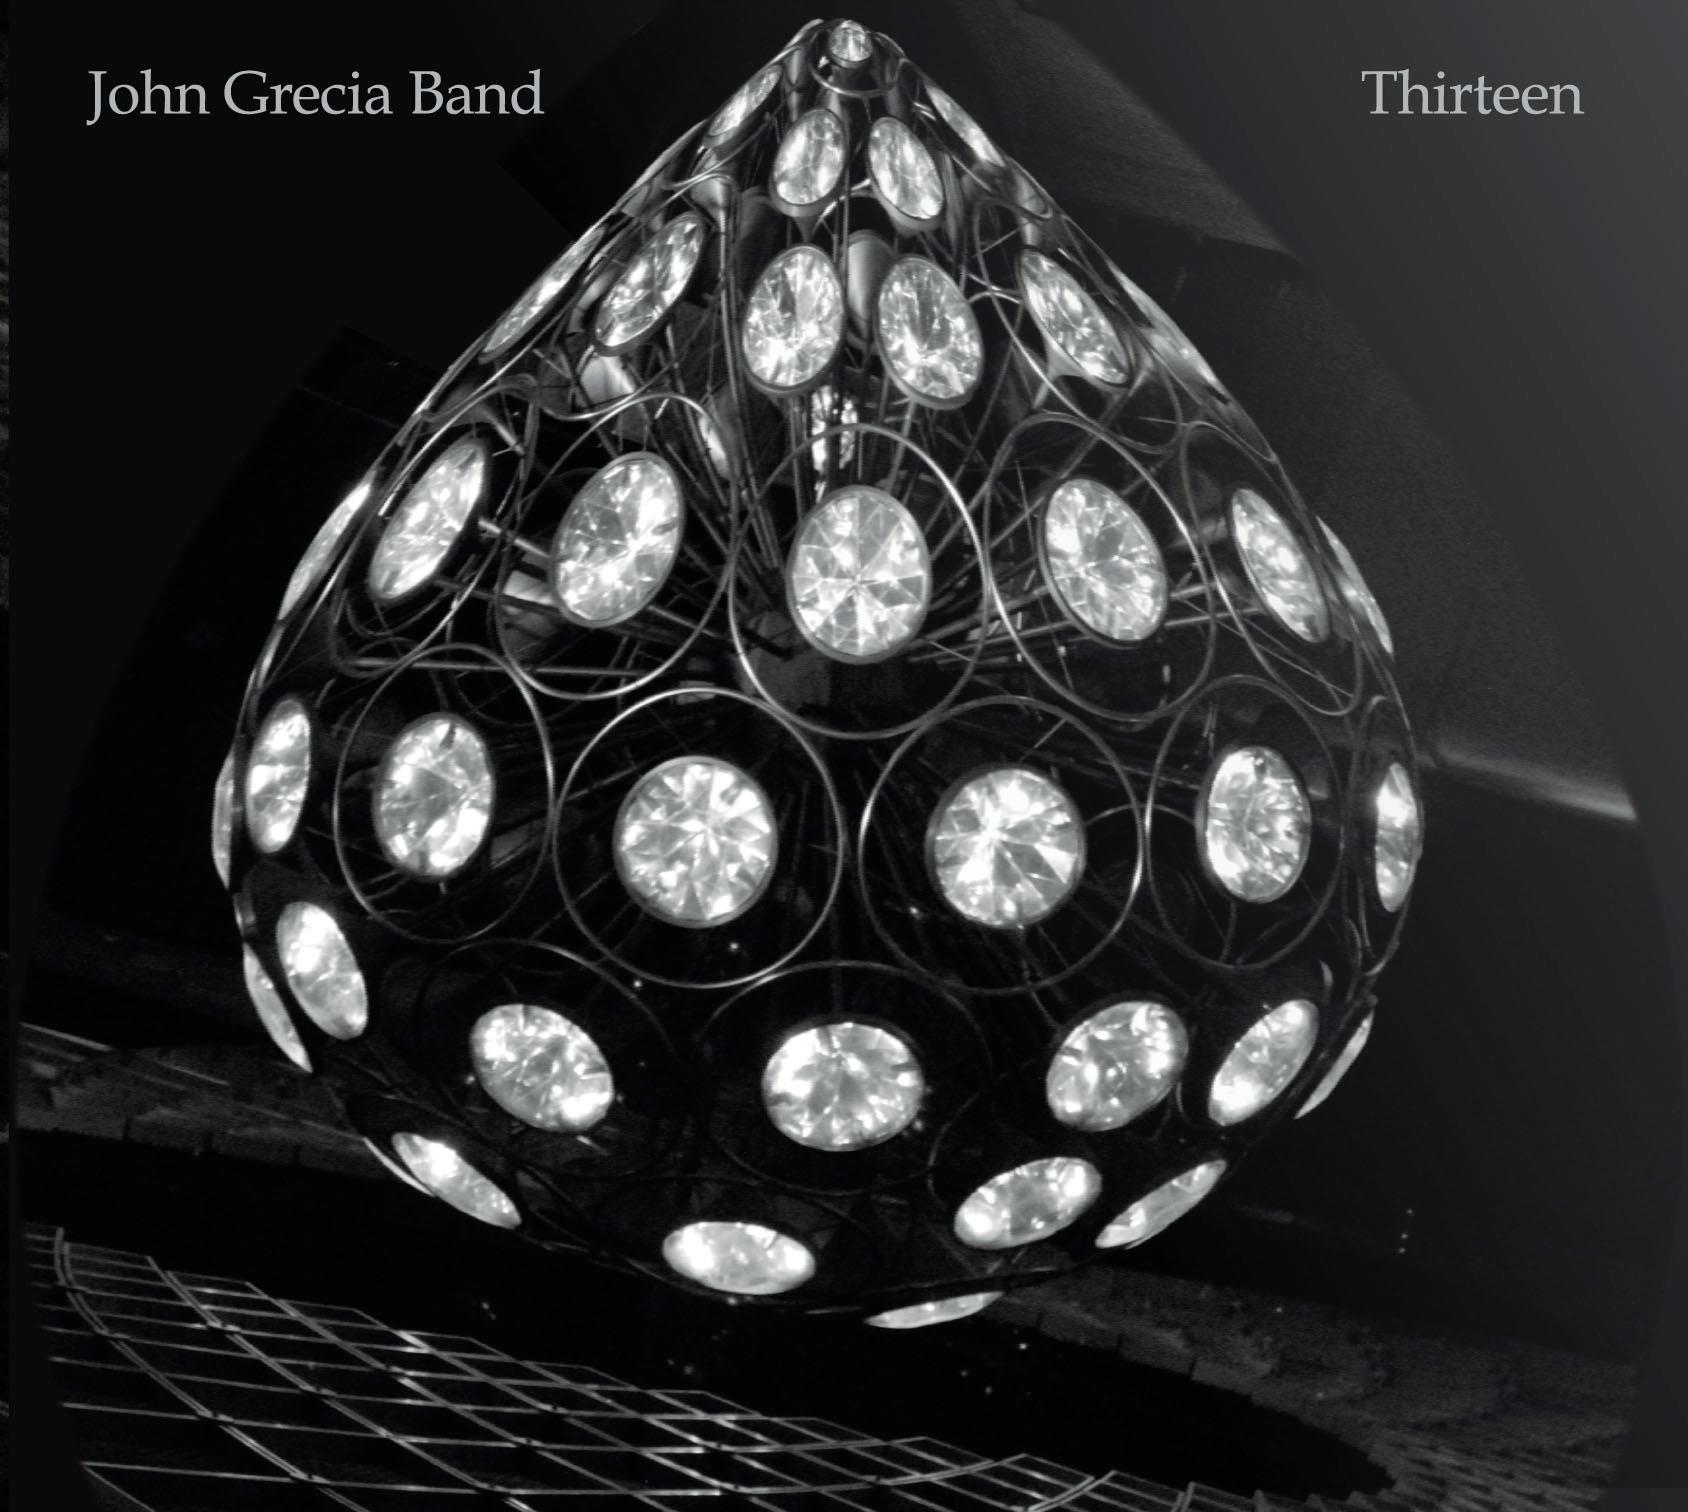 John Grecia Band